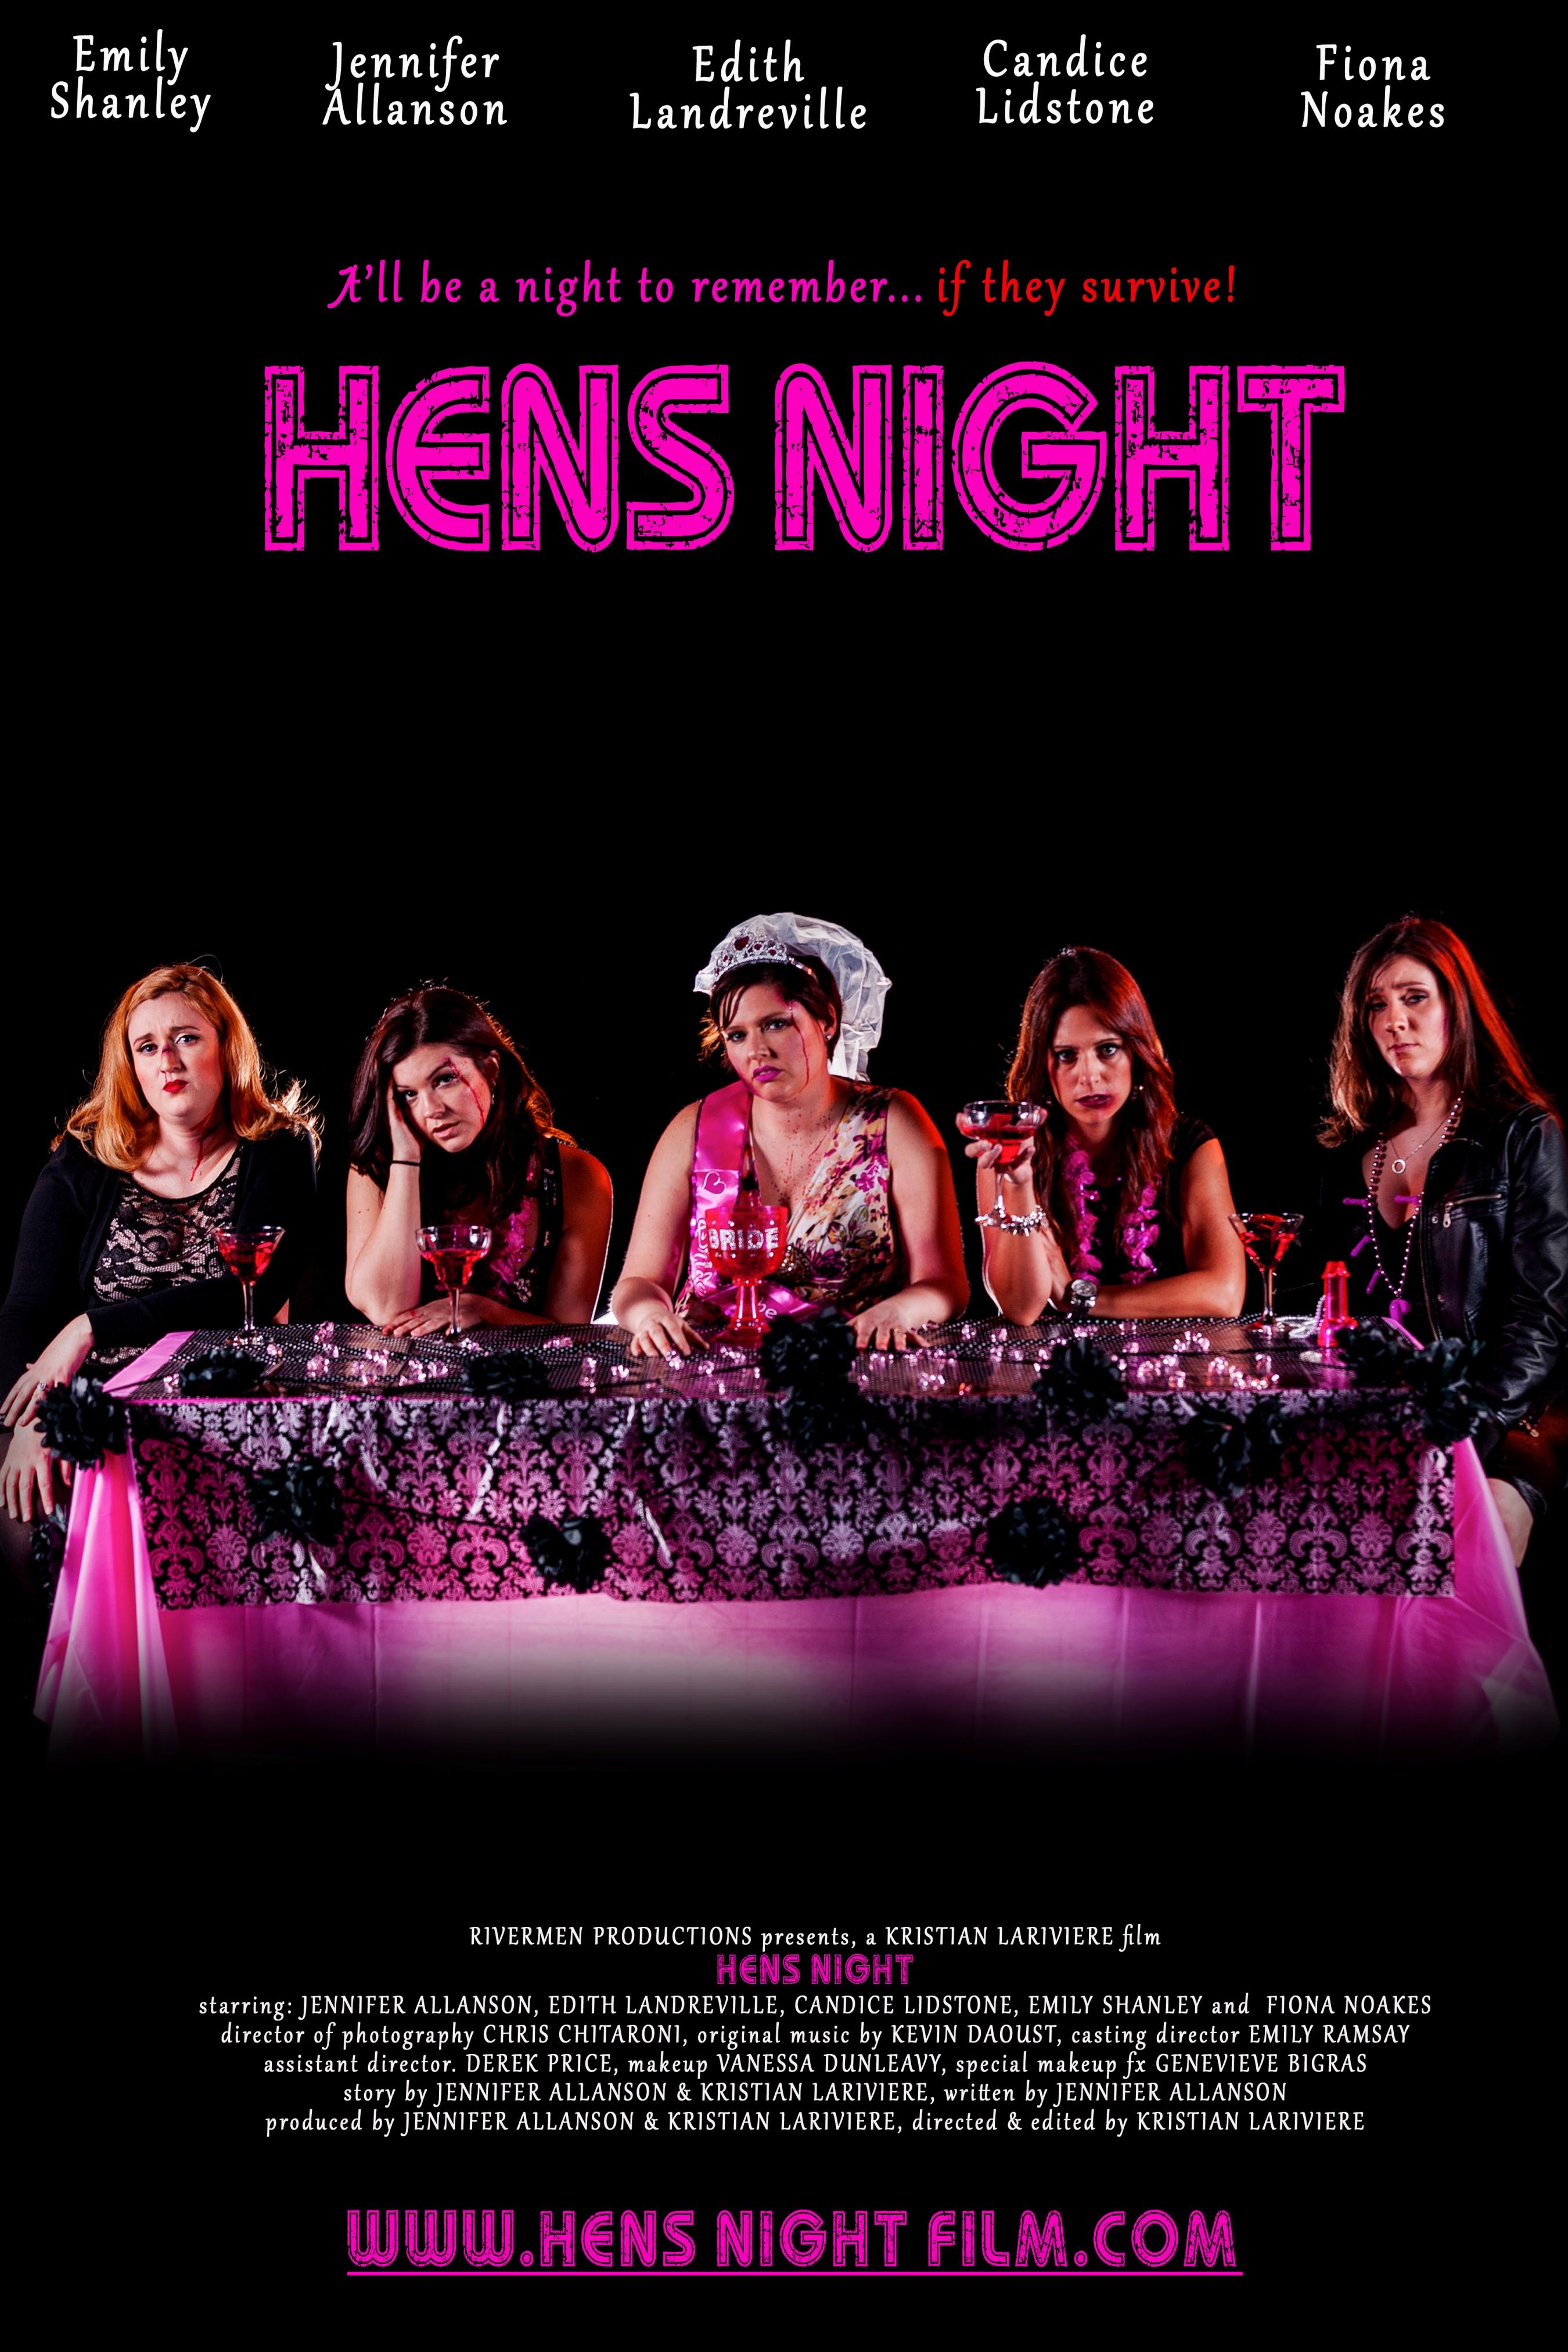 Hens Night poster